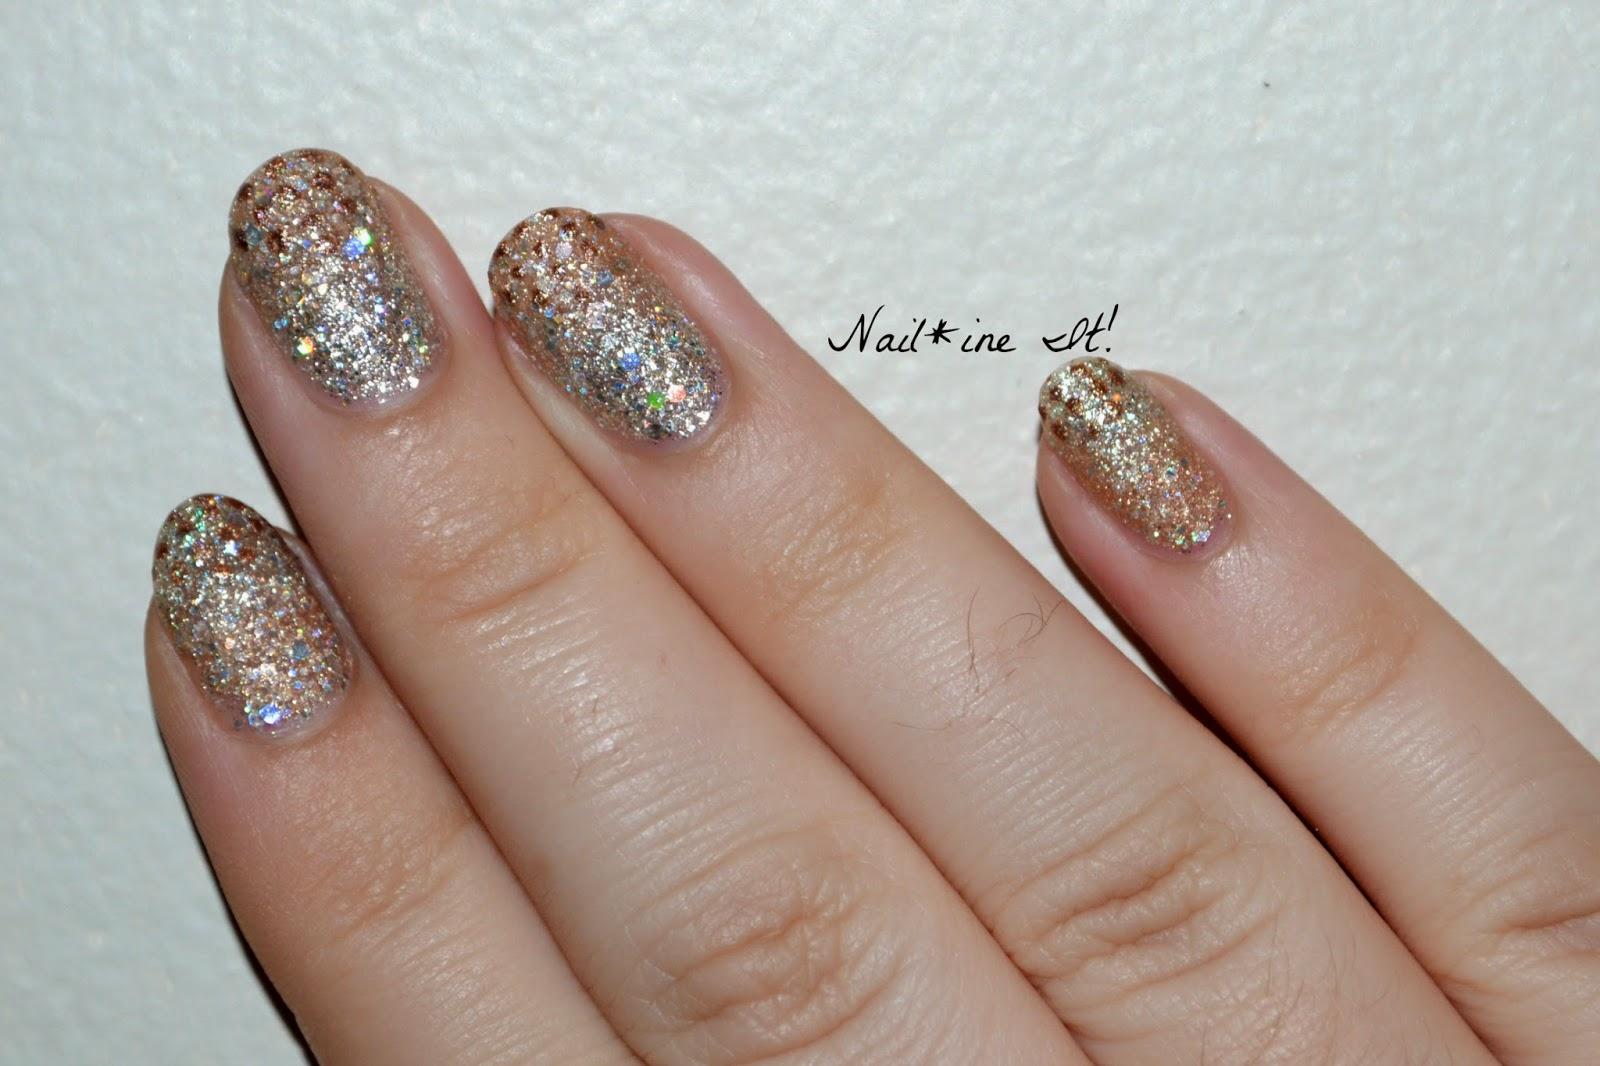 Nail*ine It!: French Dotticure over a Subtle Pixie Dust Gradient